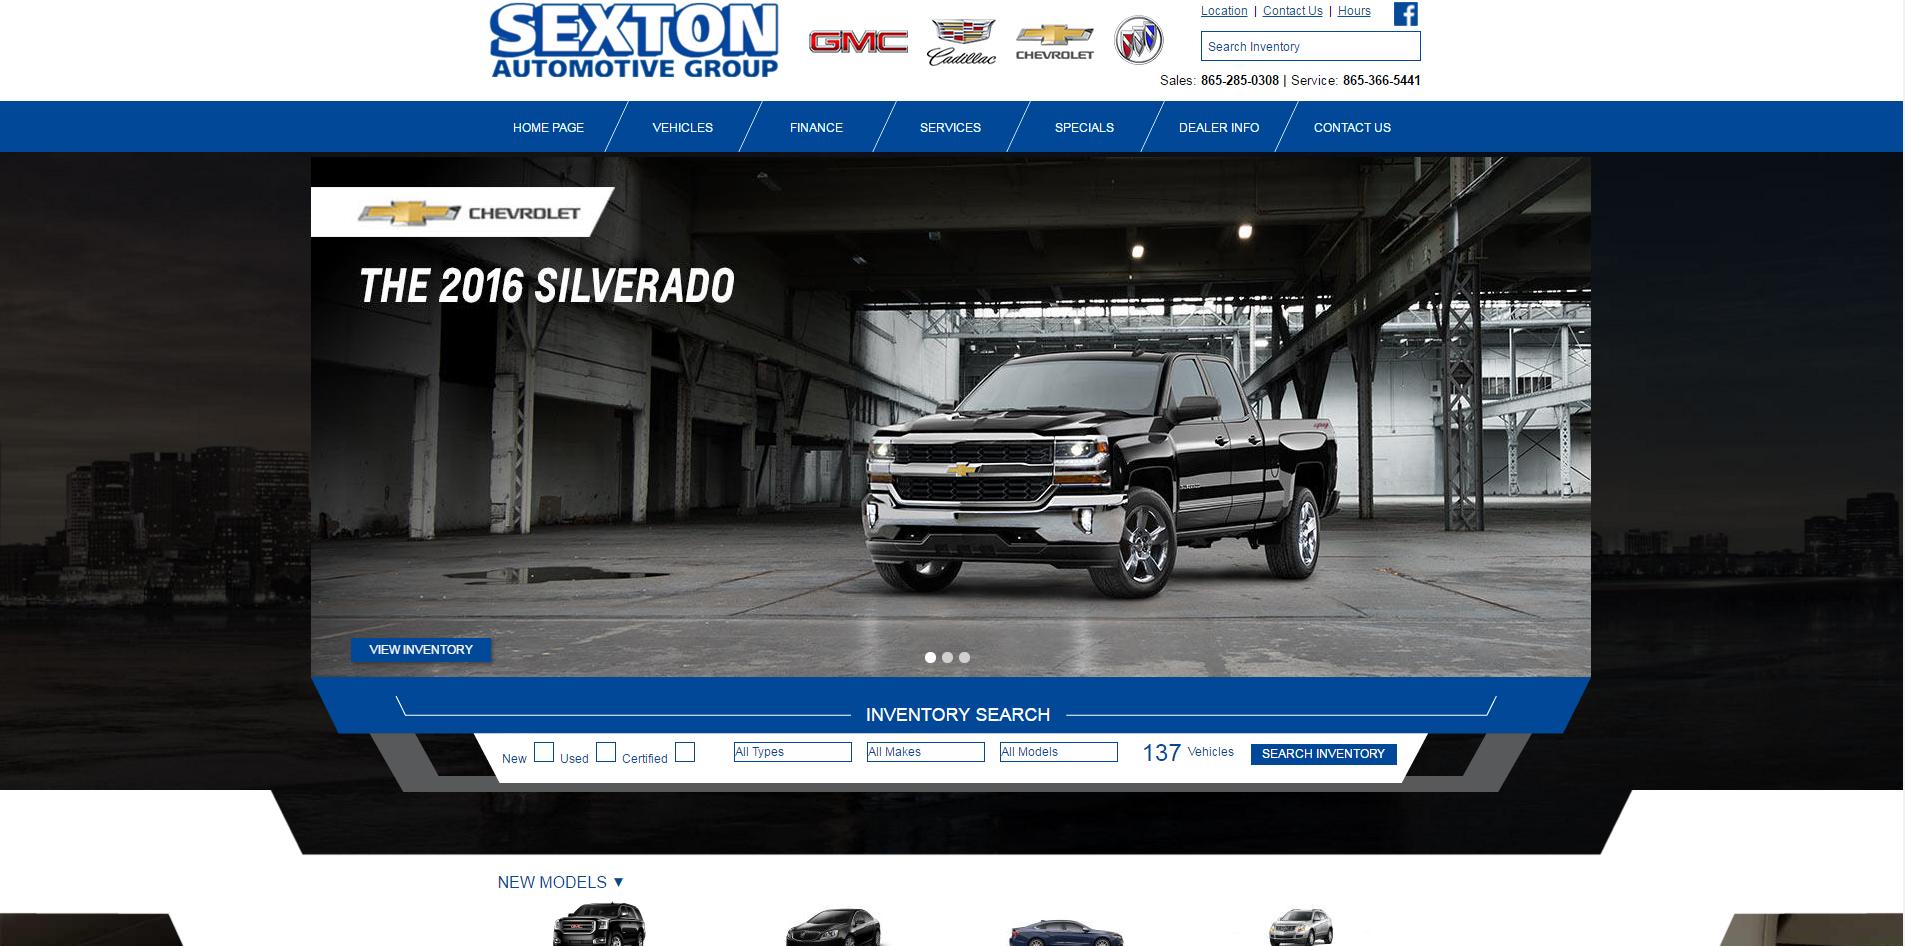 Sexton Automotive Group (After) 1.1